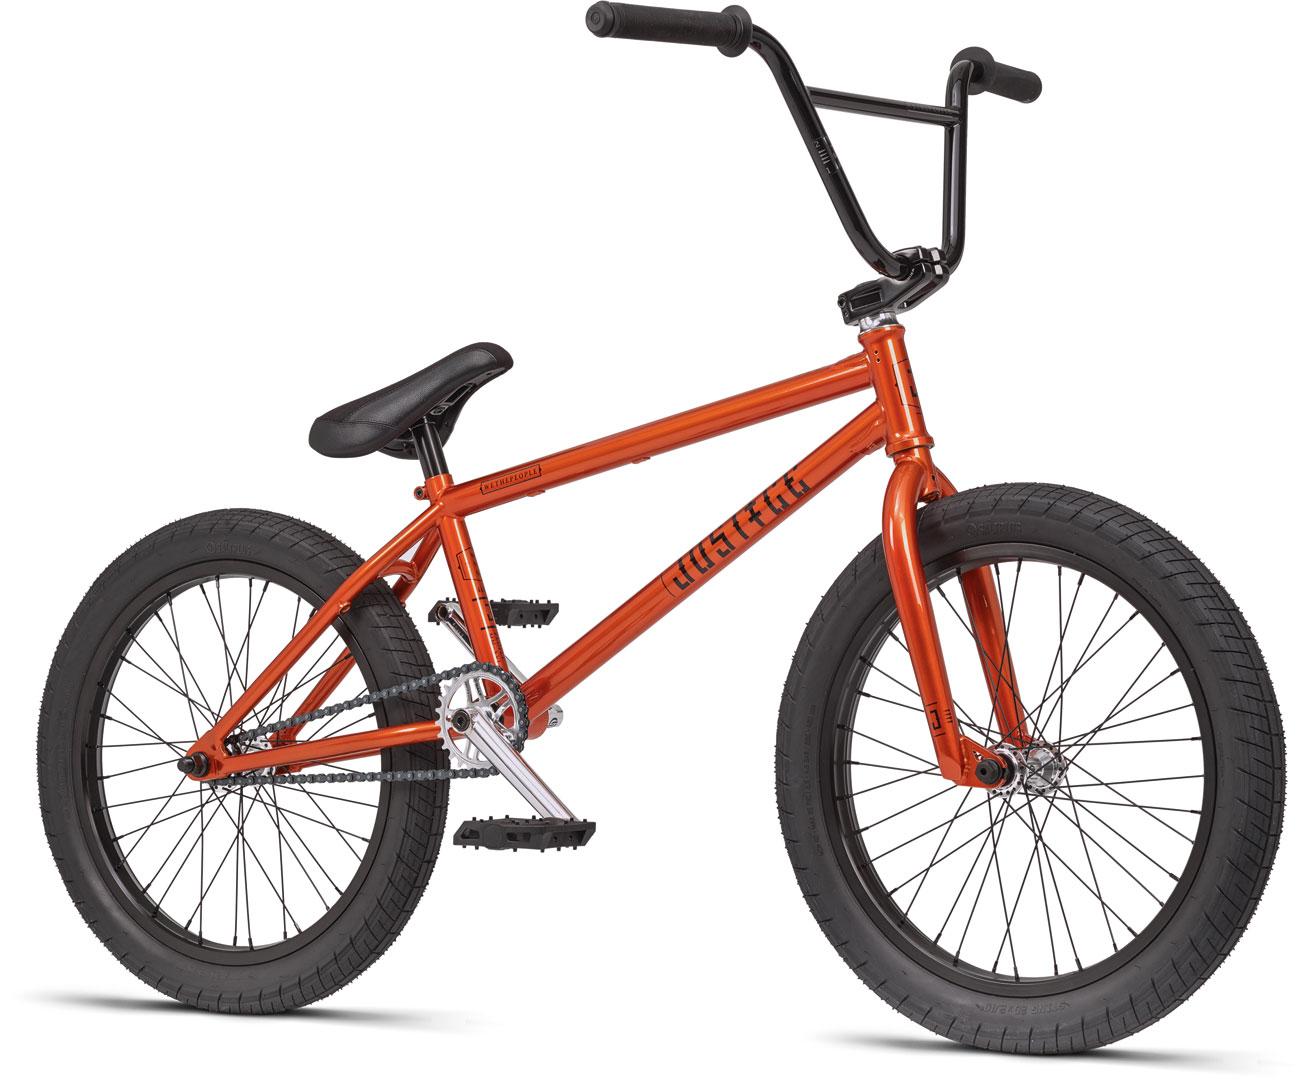 "JUSTICE 20.5"" BMX Bike 2016 orange   Warehouse One"